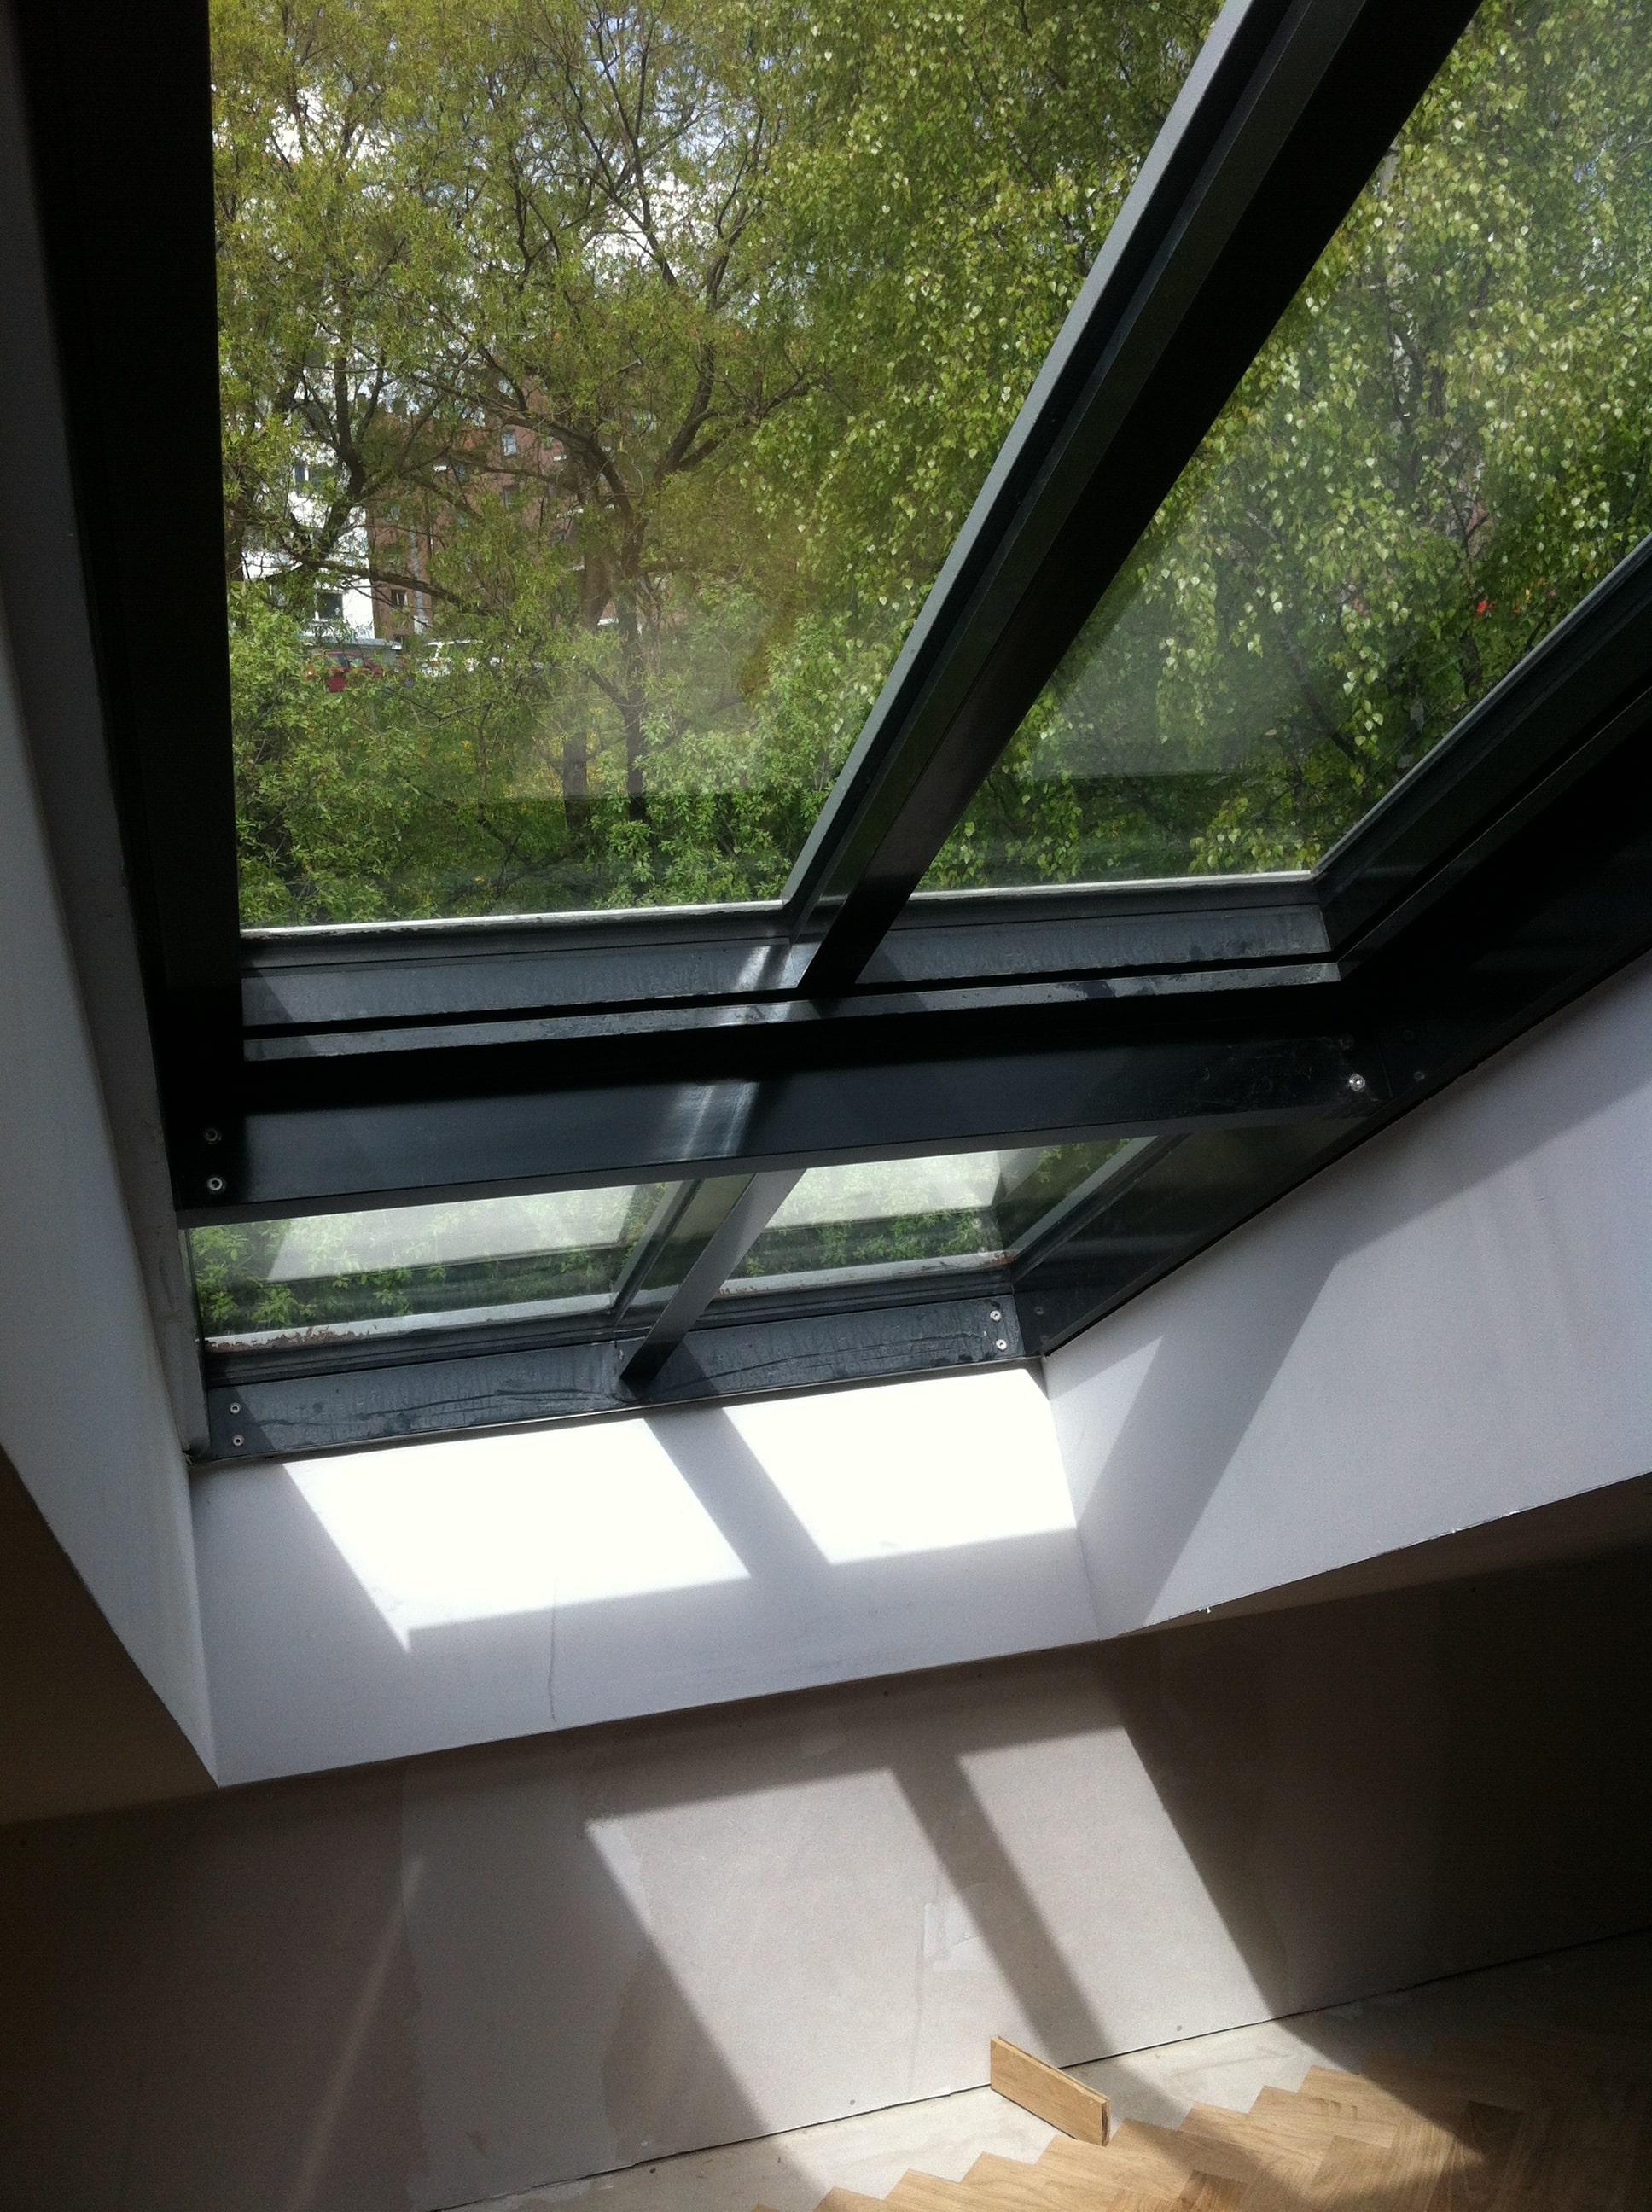 midos rooflights house